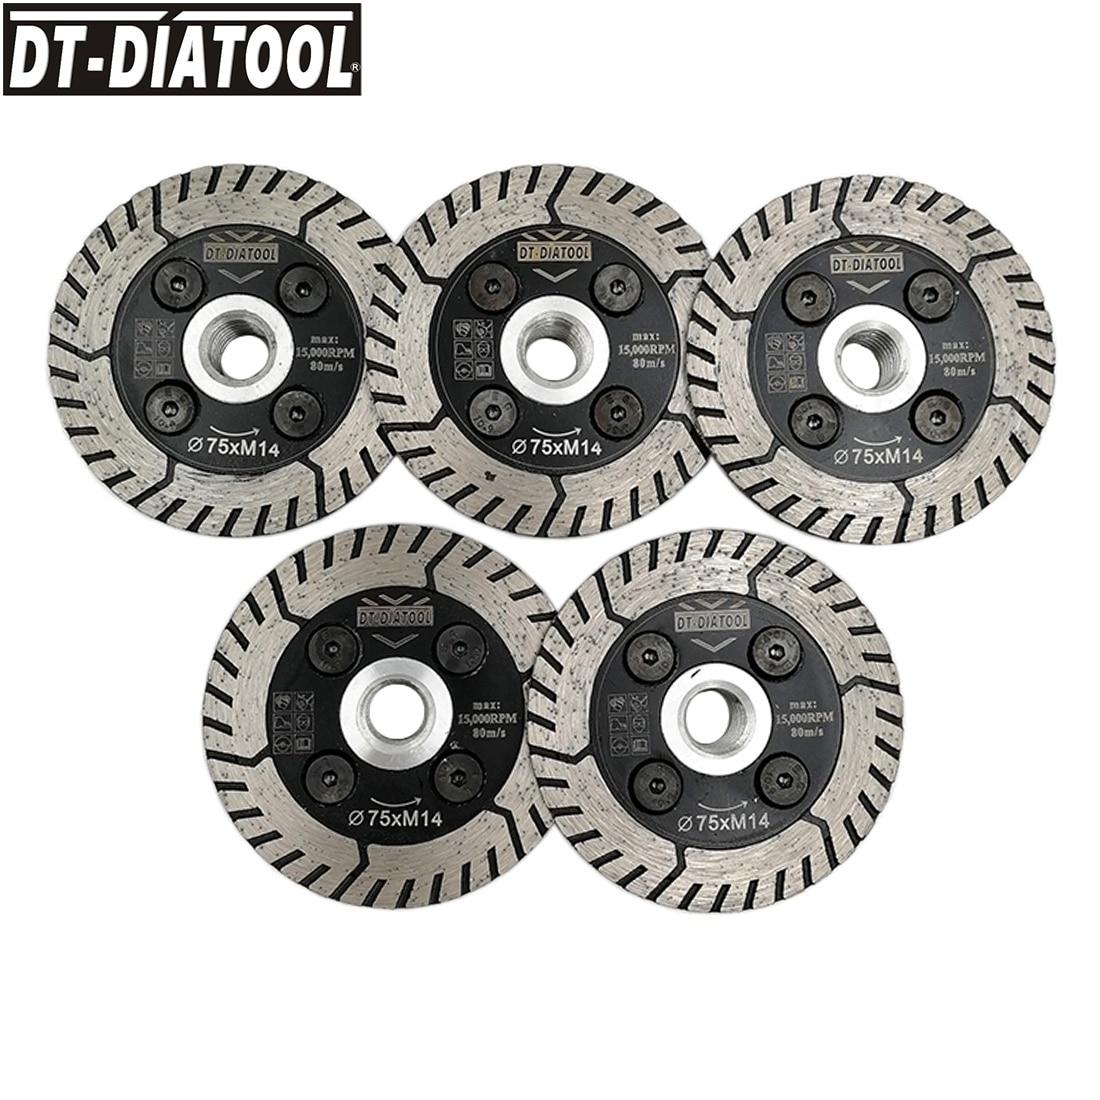 DT DIATOOL 5pcs pk Dia 75 115 125mm Diamond Saw Blades Cutting Grindng Disc M14 or